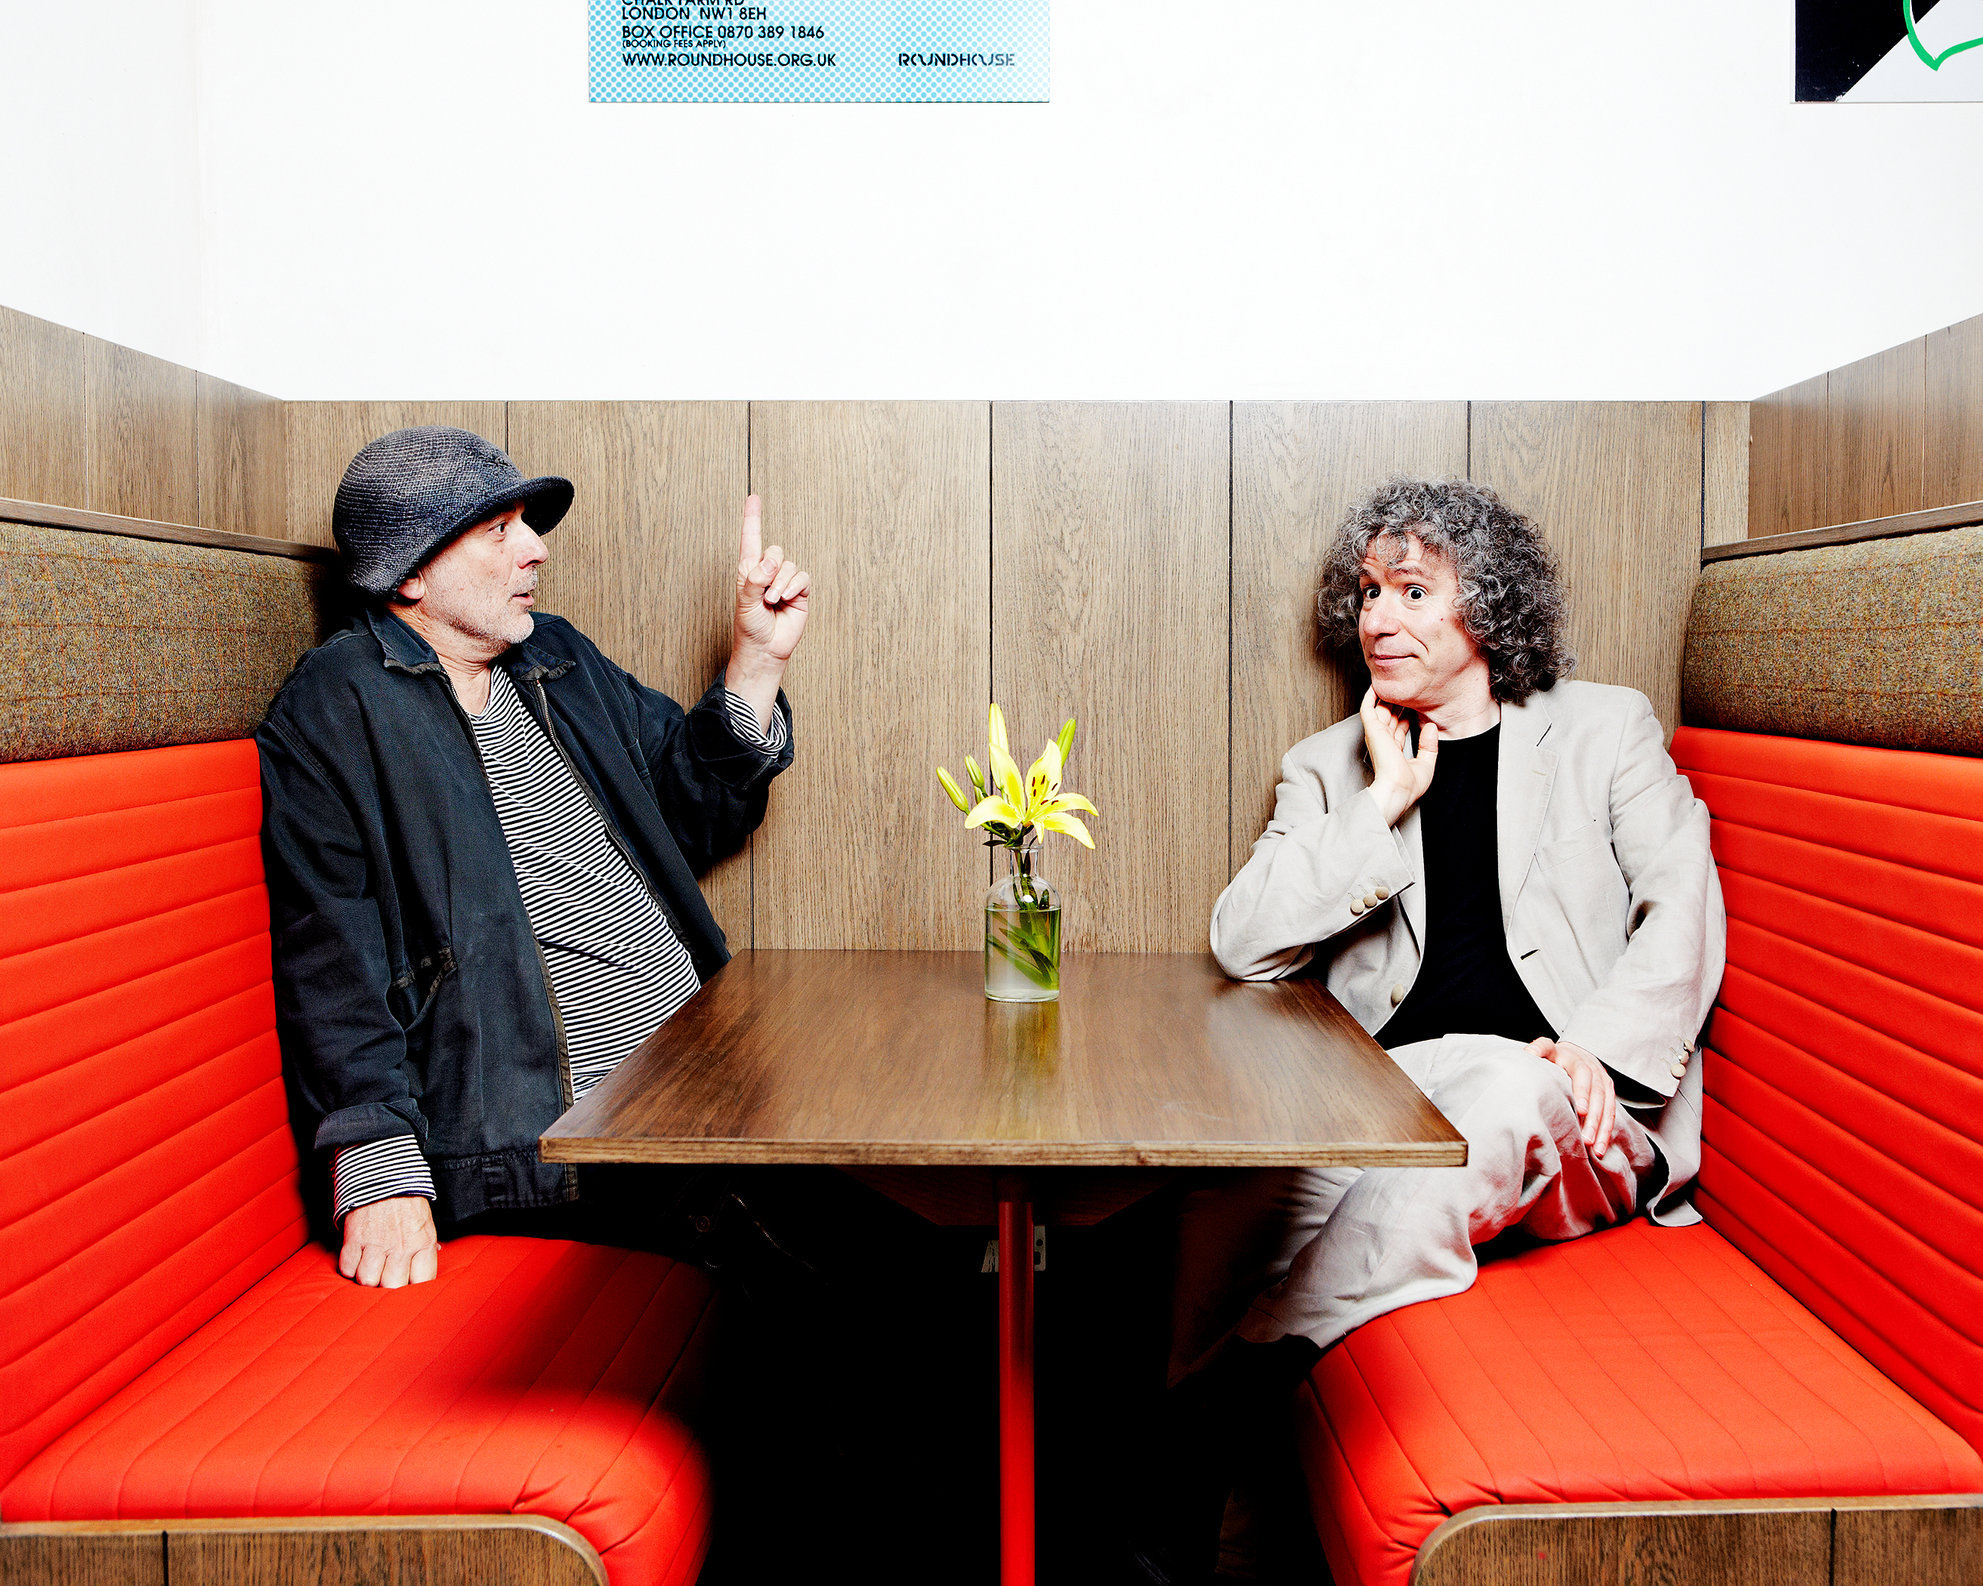 Ron Arad & Stephen Isserlis, The Roundhouse